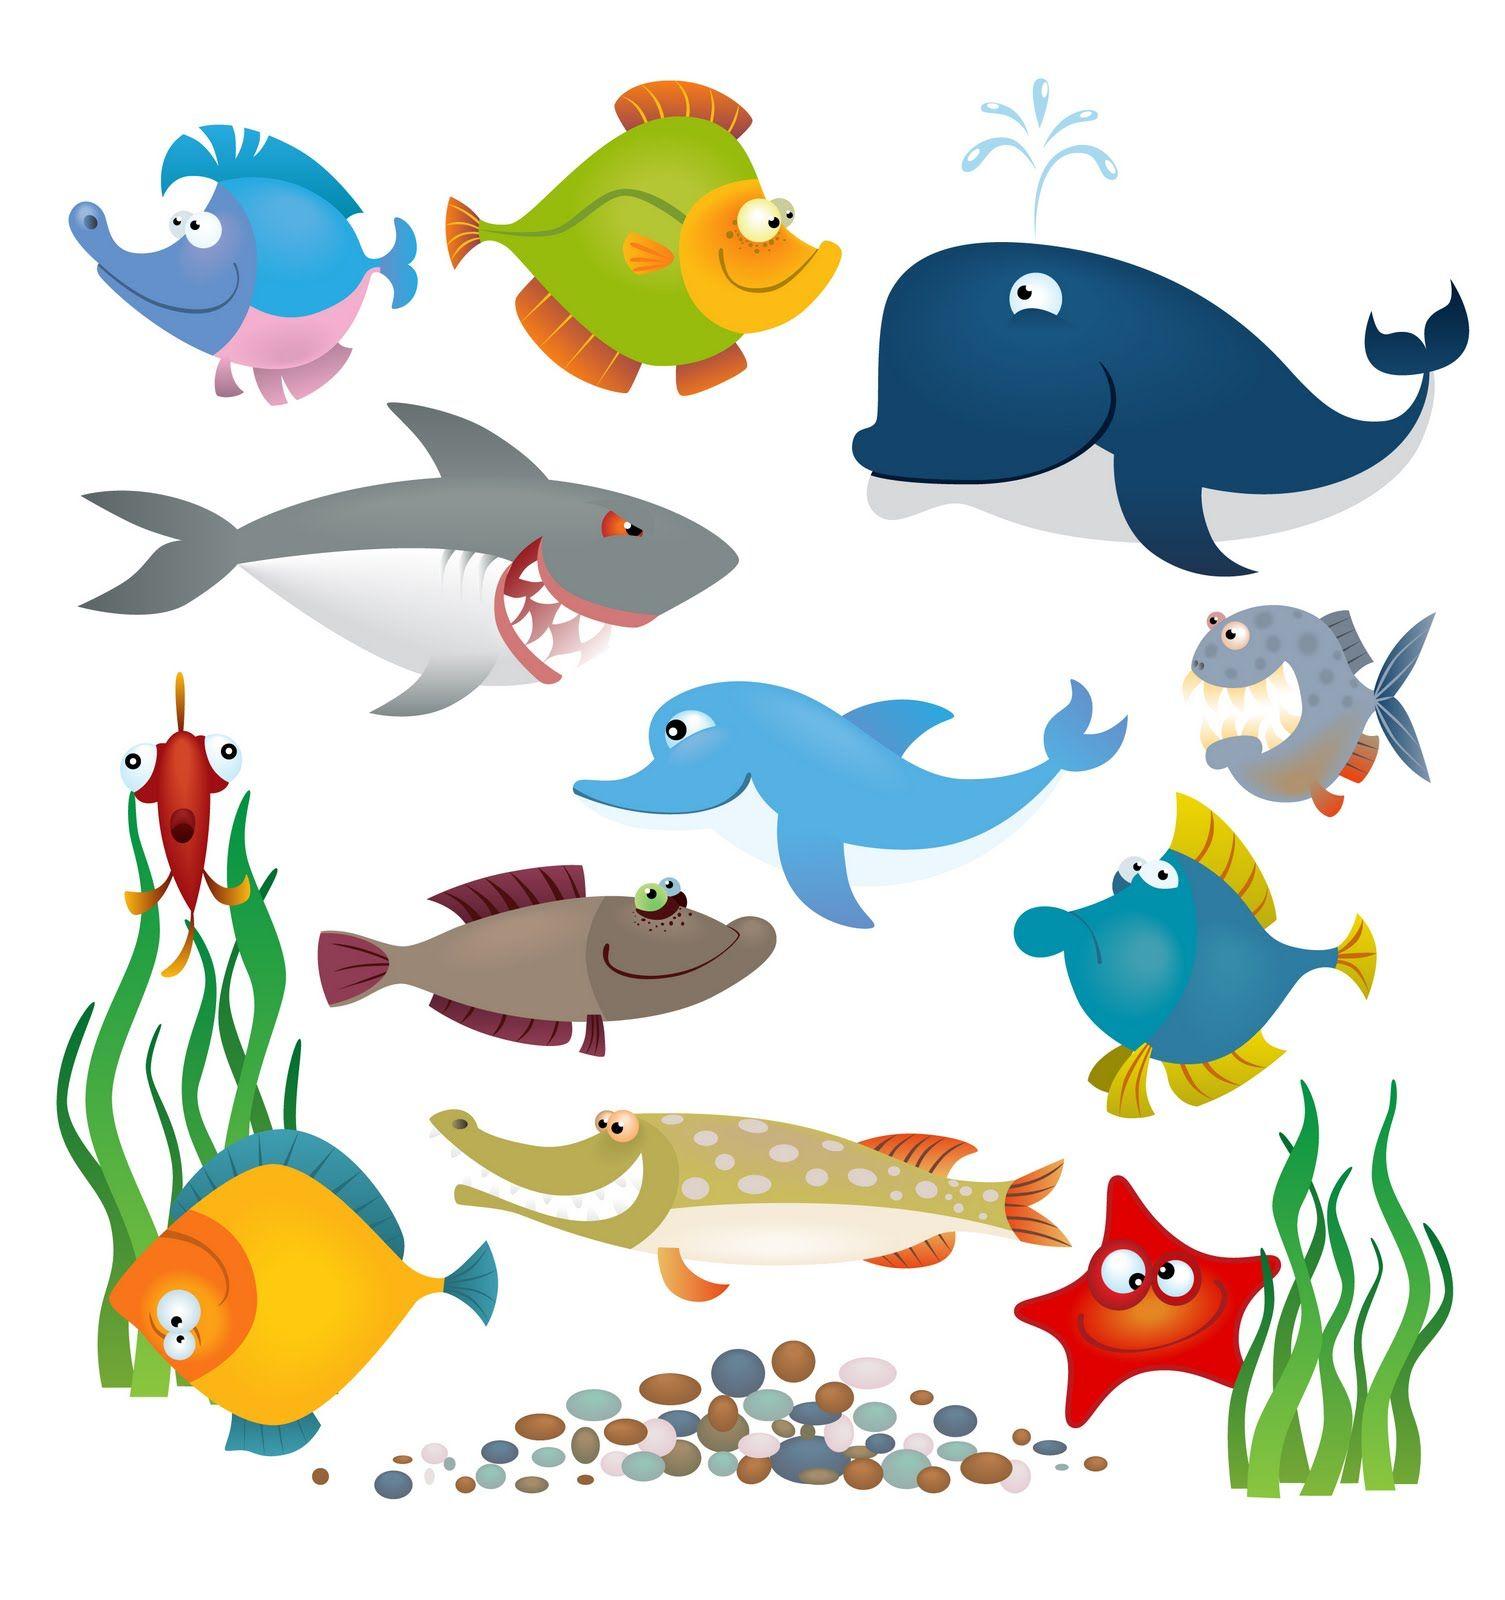 Cute Cartoon Sea Animals Jaddid Hd Wallpapers Backgrounds Images Photos Cartoon Sea Animals Ocean Animals Animal Book